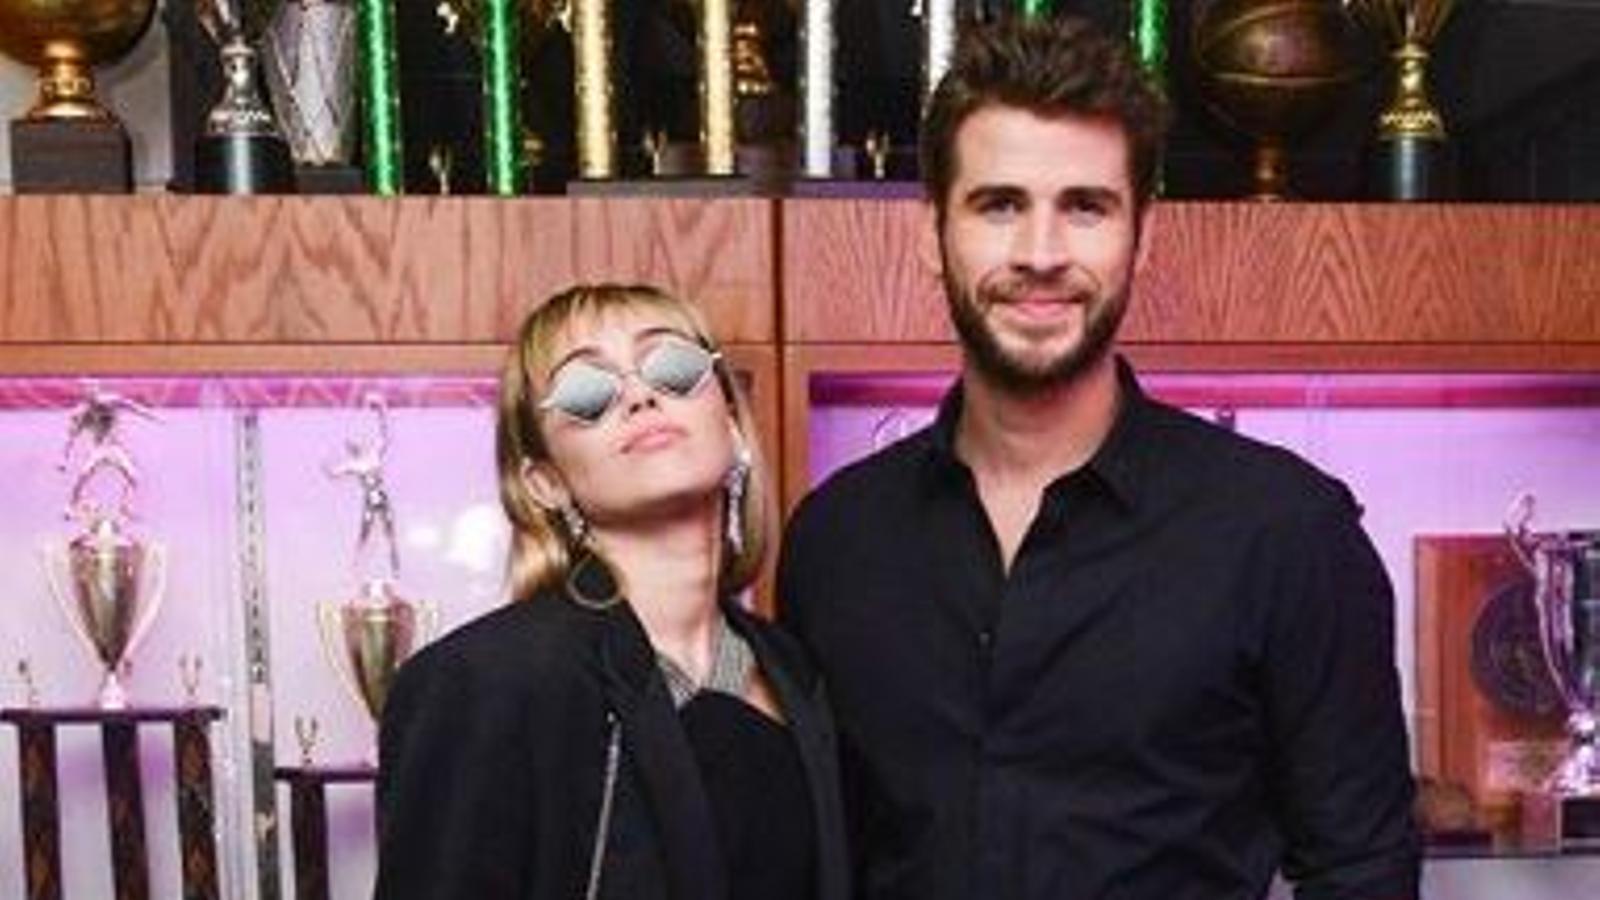 Primeres paraules de Miley Cyrus després de divorciar-se de Liam Hemsworth